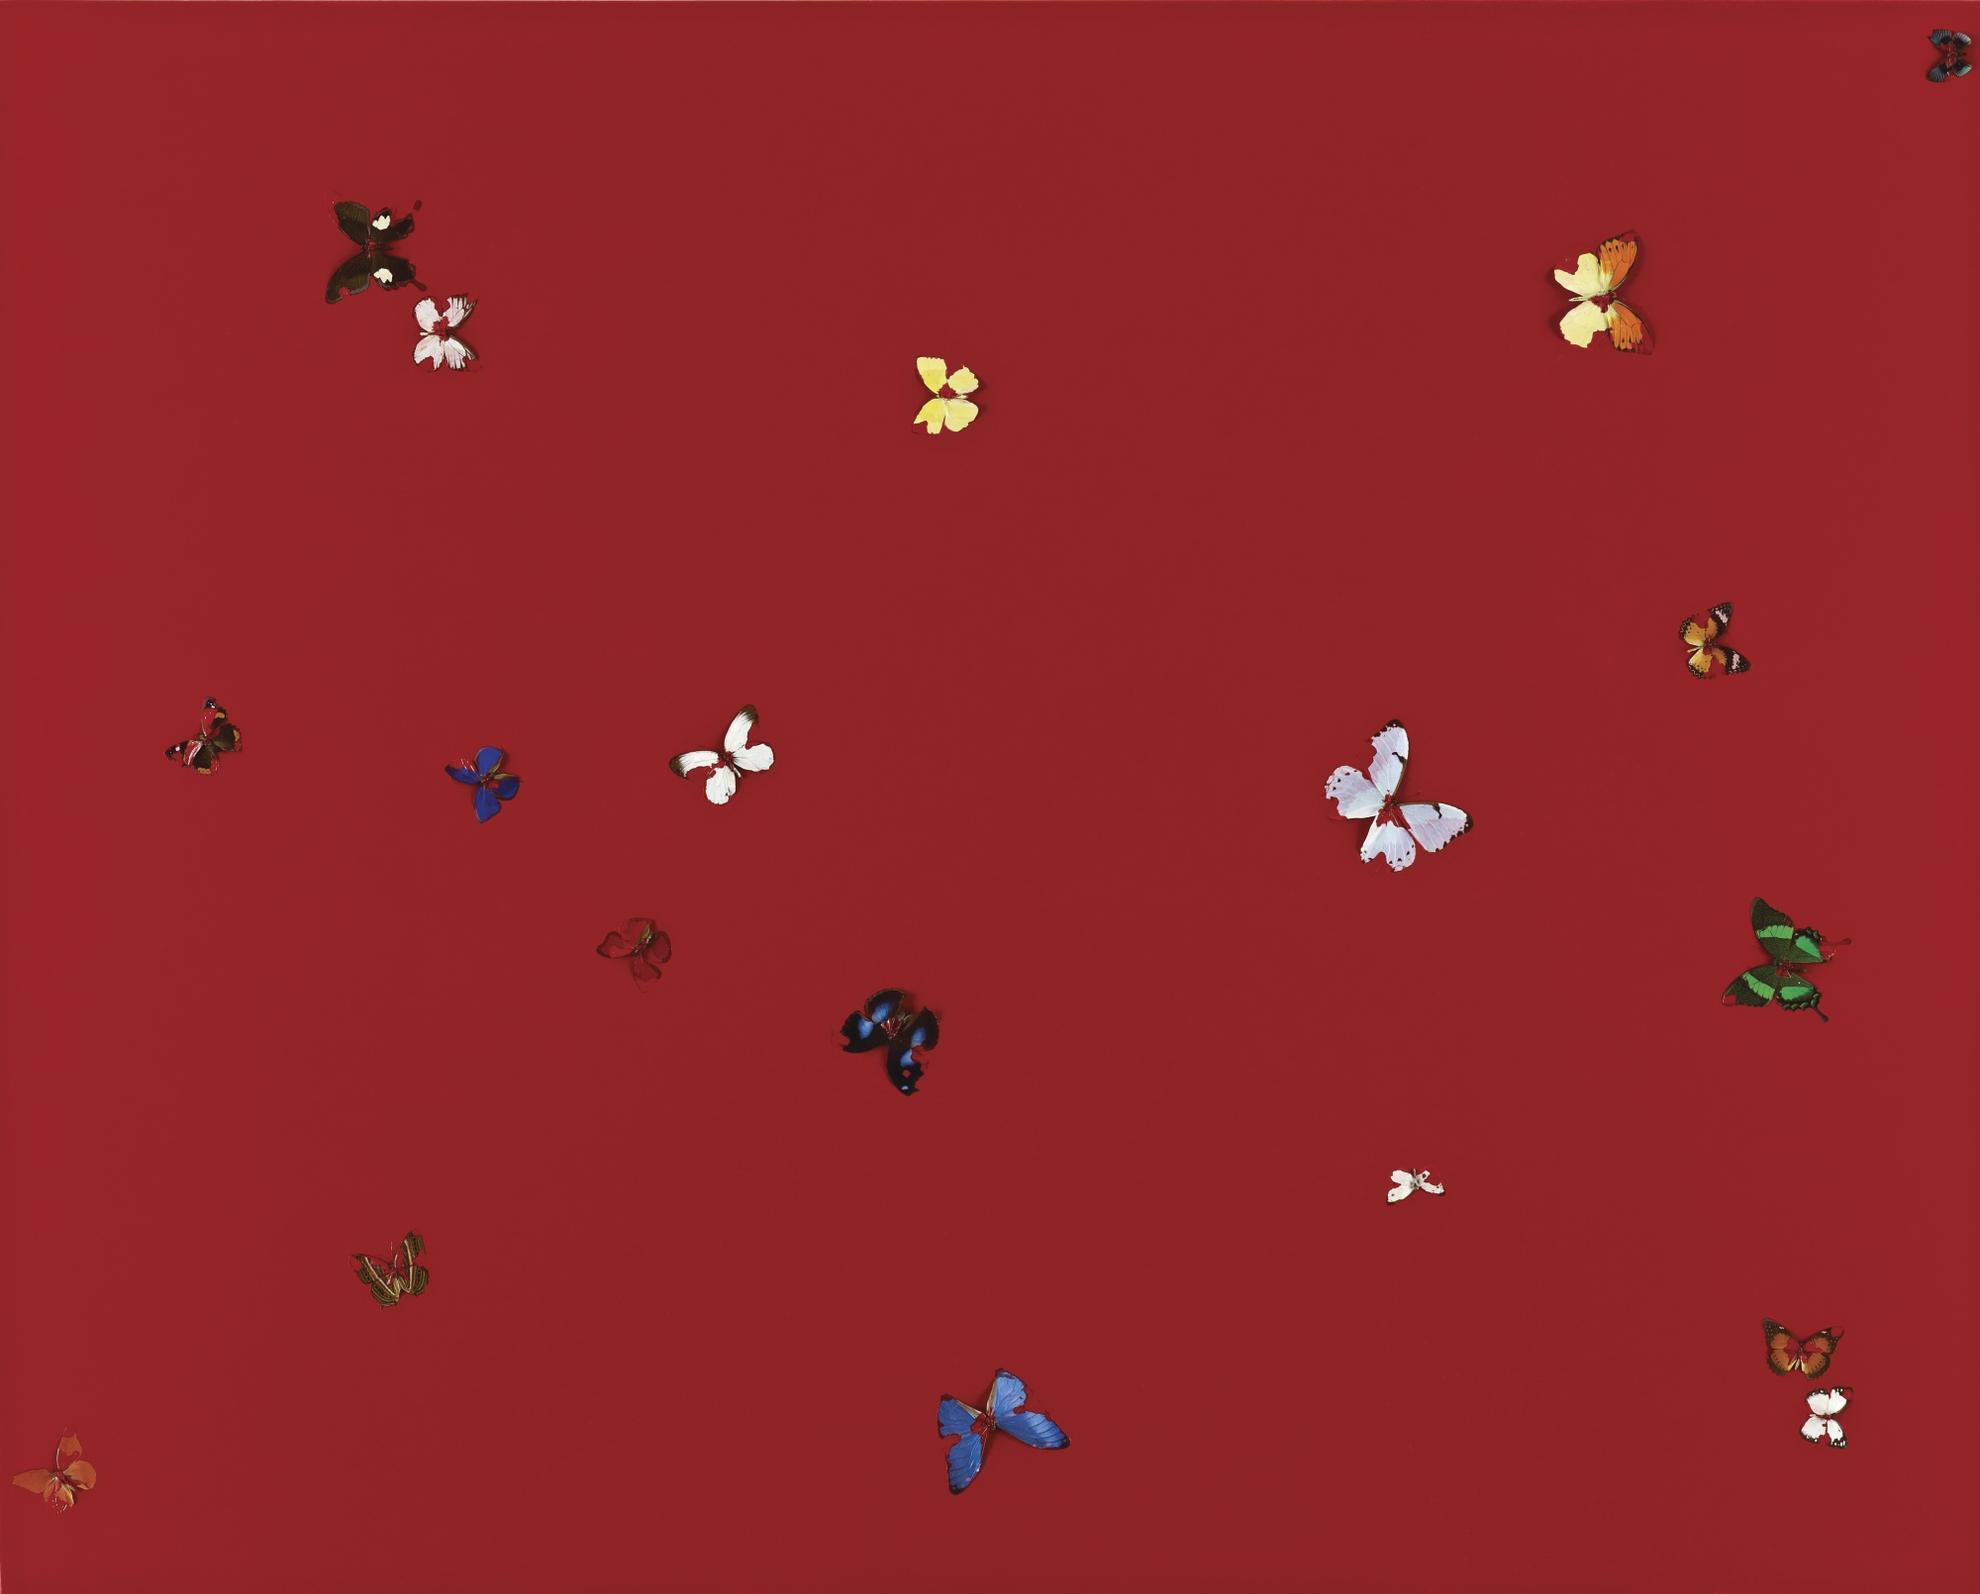 Damien Hirst-Sky Love-2004